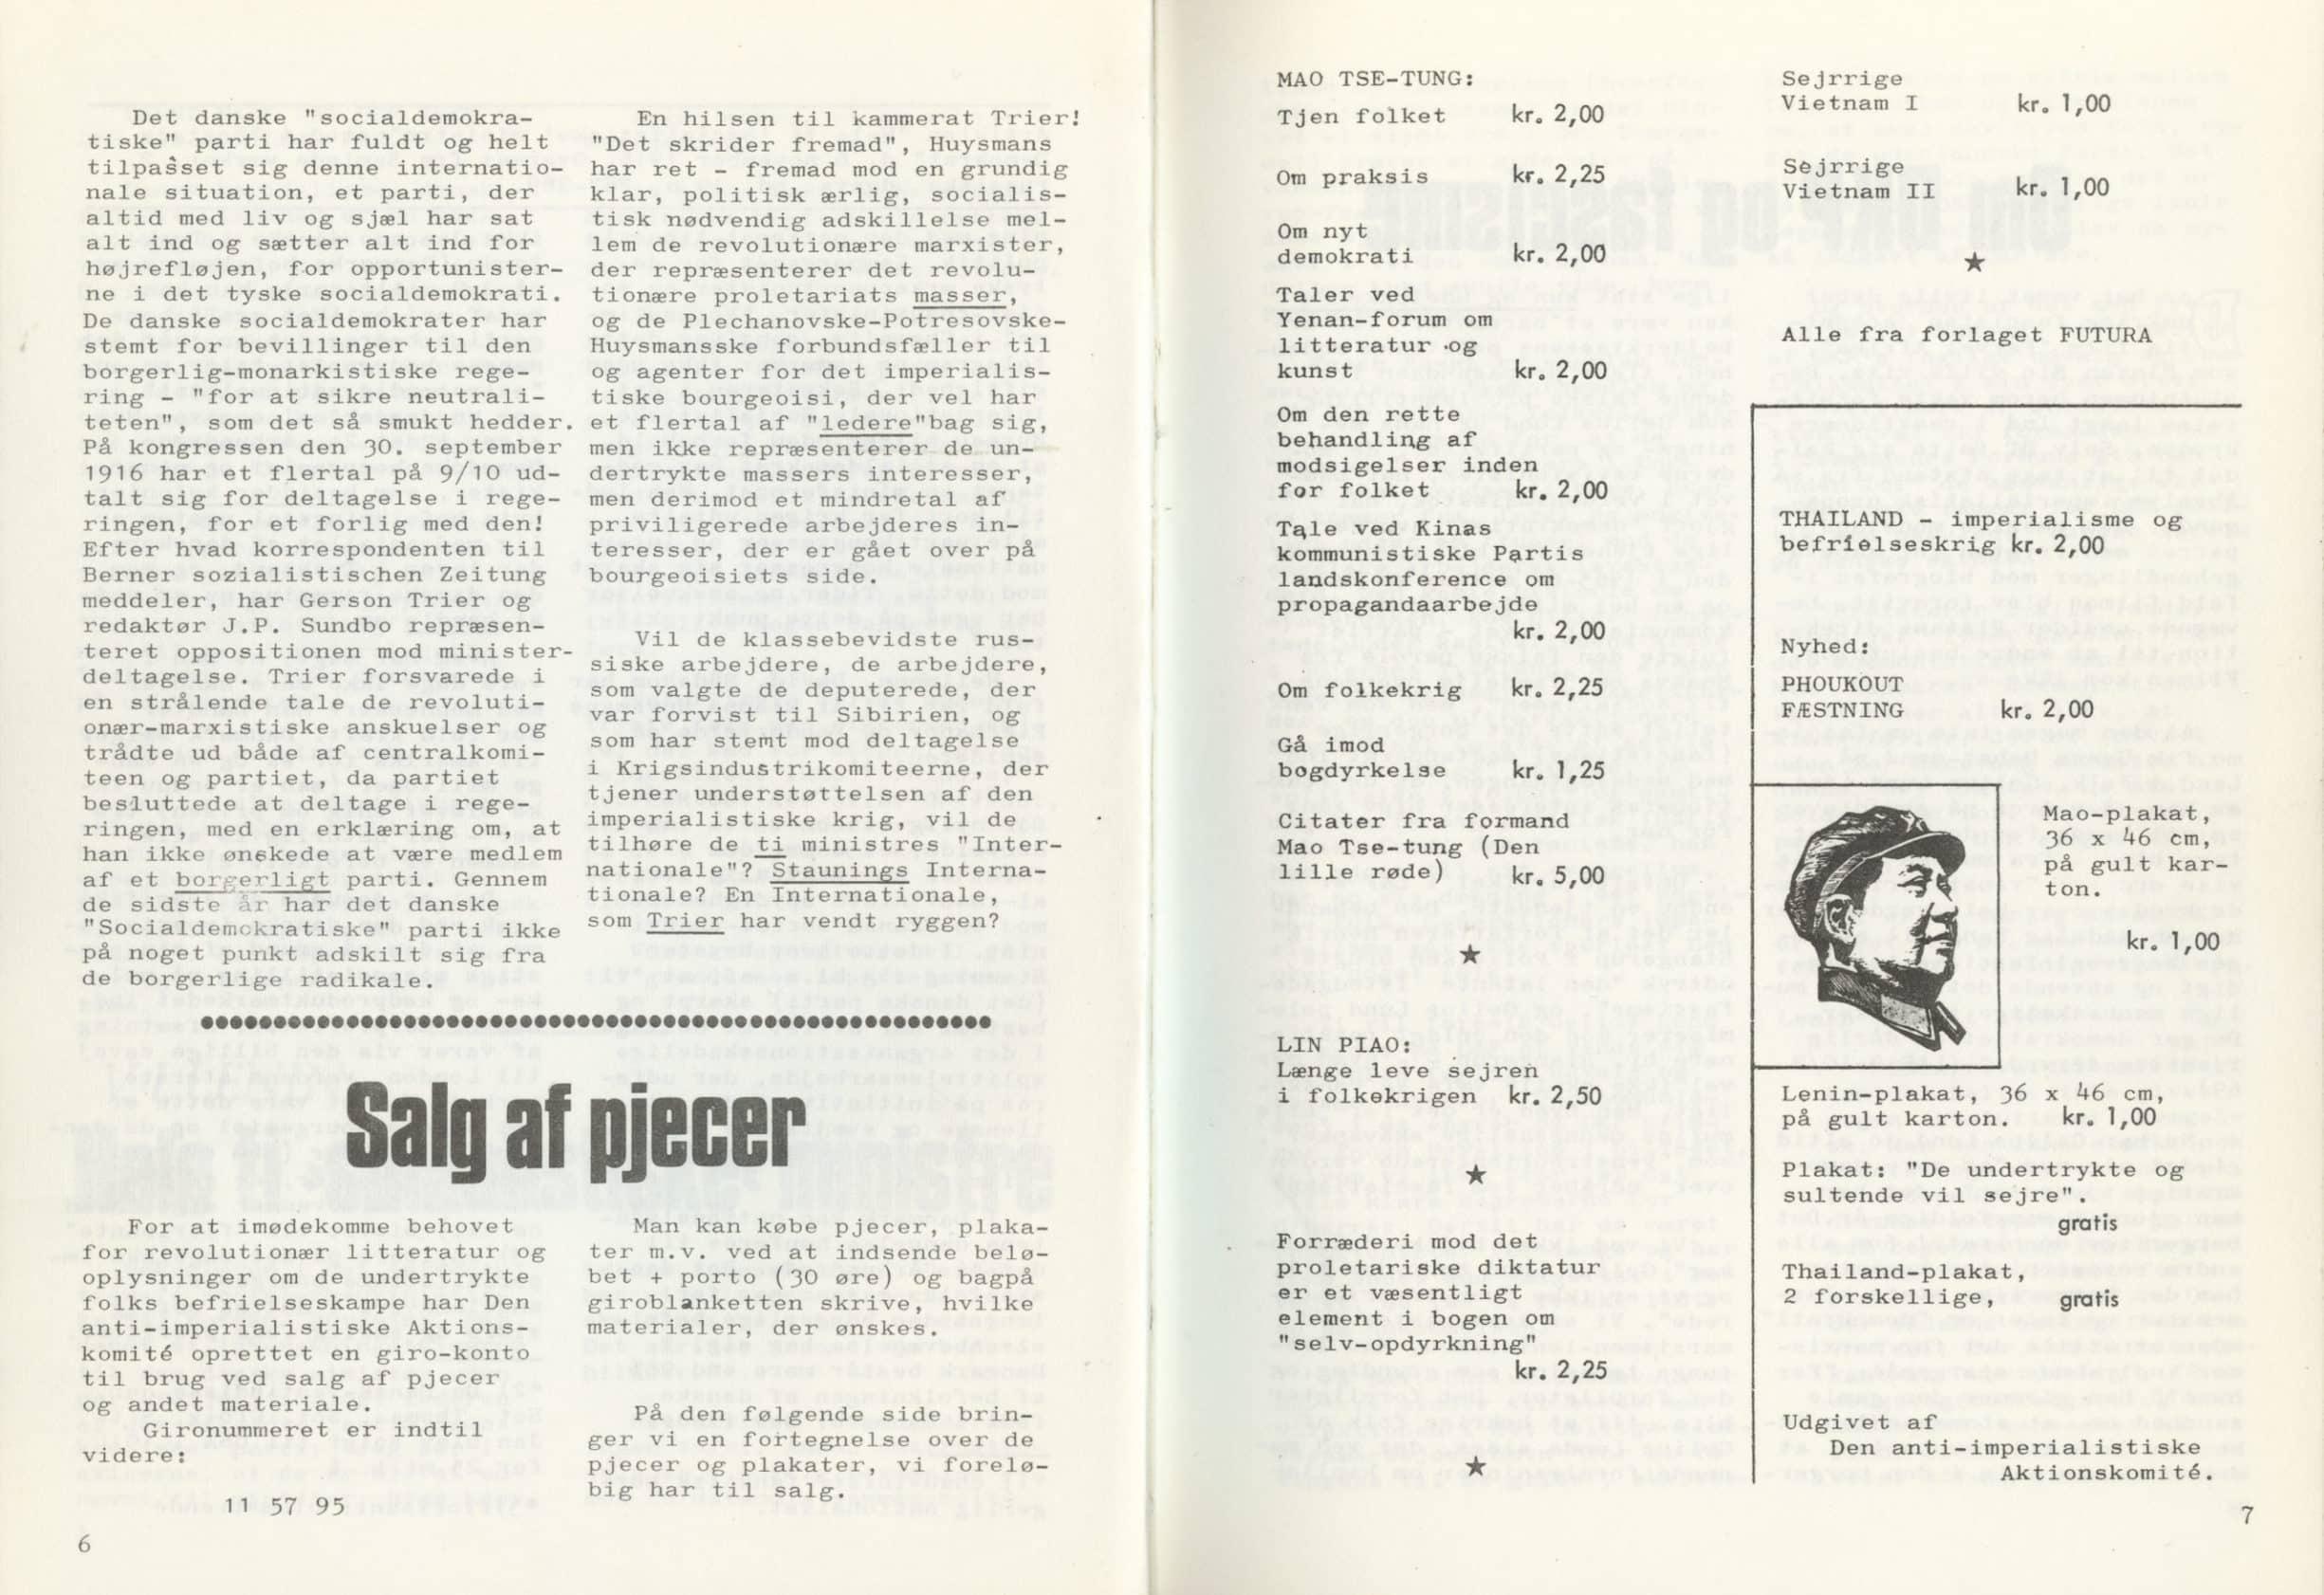 Ungkommunisten1969, nr. 4, s. 6-7.